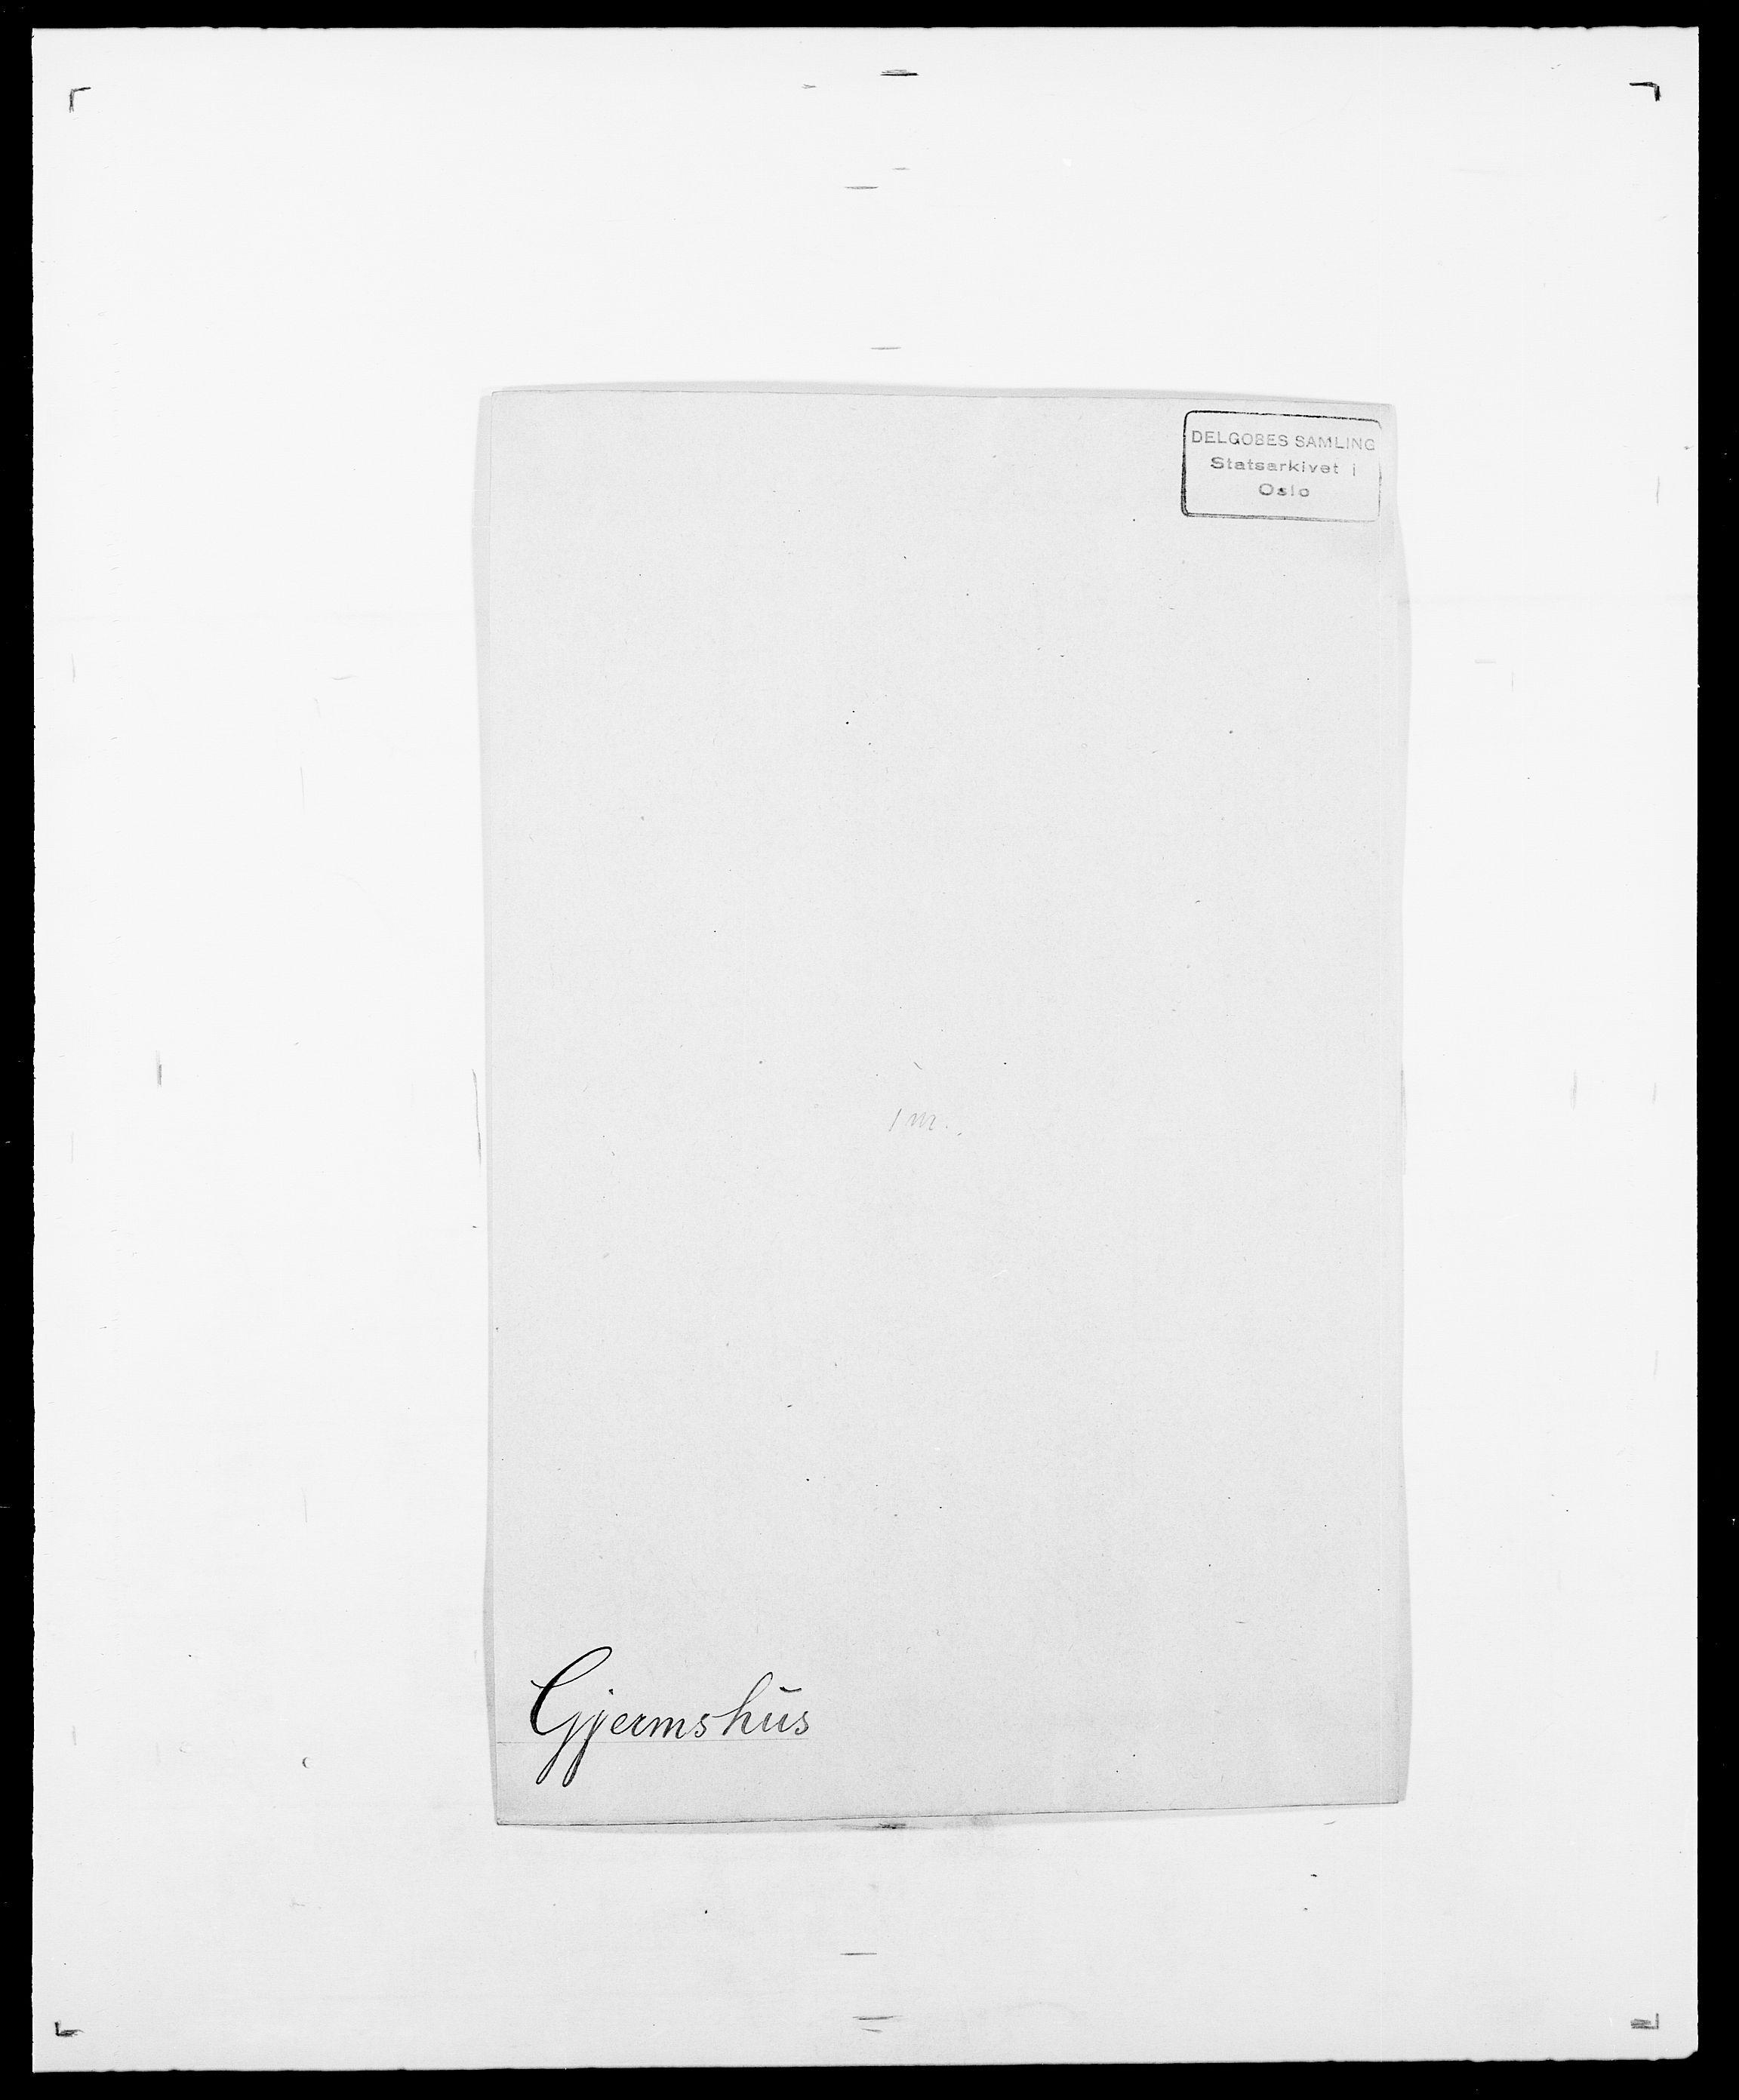 SAO, Delgobe, Charles Antoine - samling, D/Da/L0014: Giebdhausen - Grip, s. 144